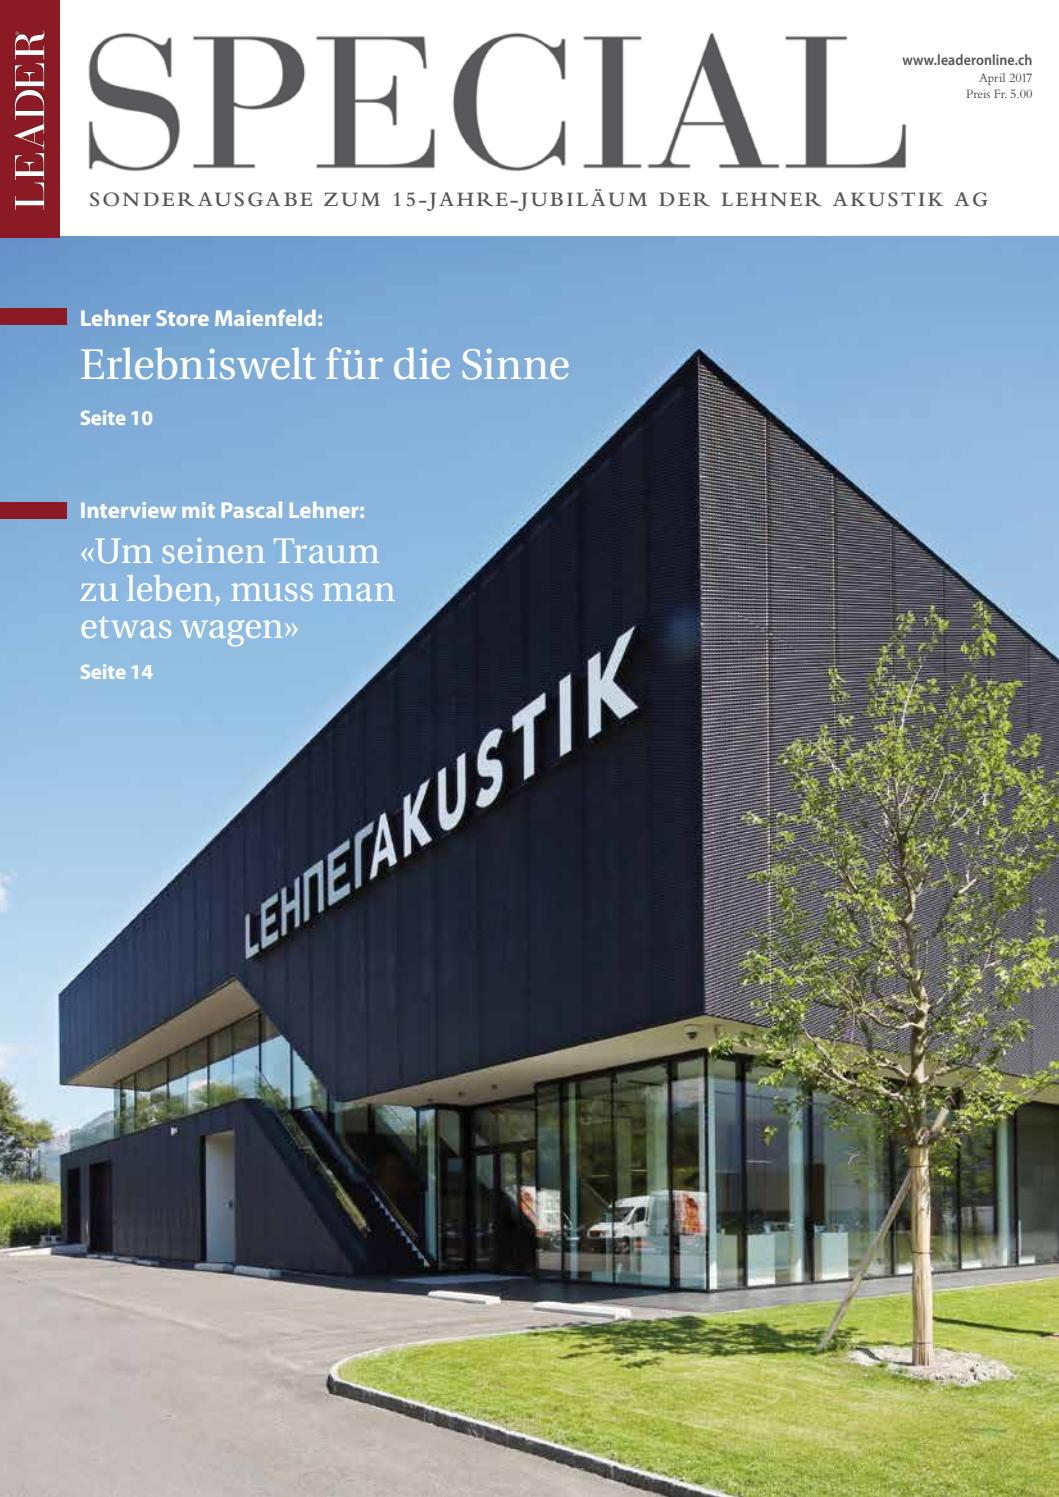 SPECIAL Lehner Akustik AG 2017 by LEADER - das Unternehmermagazin ...